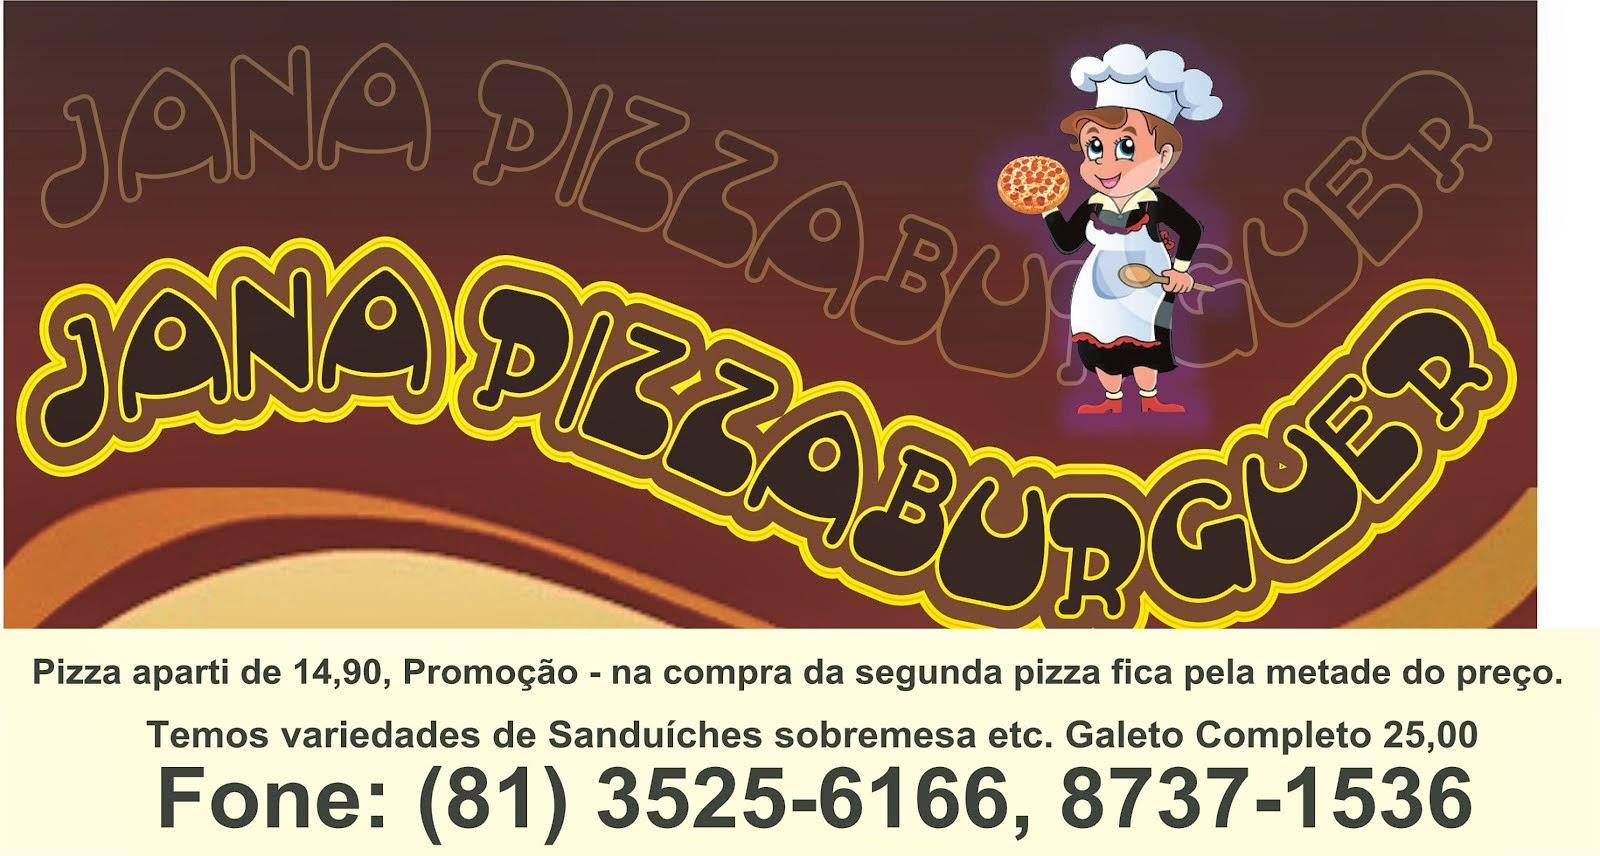 JapaPizza